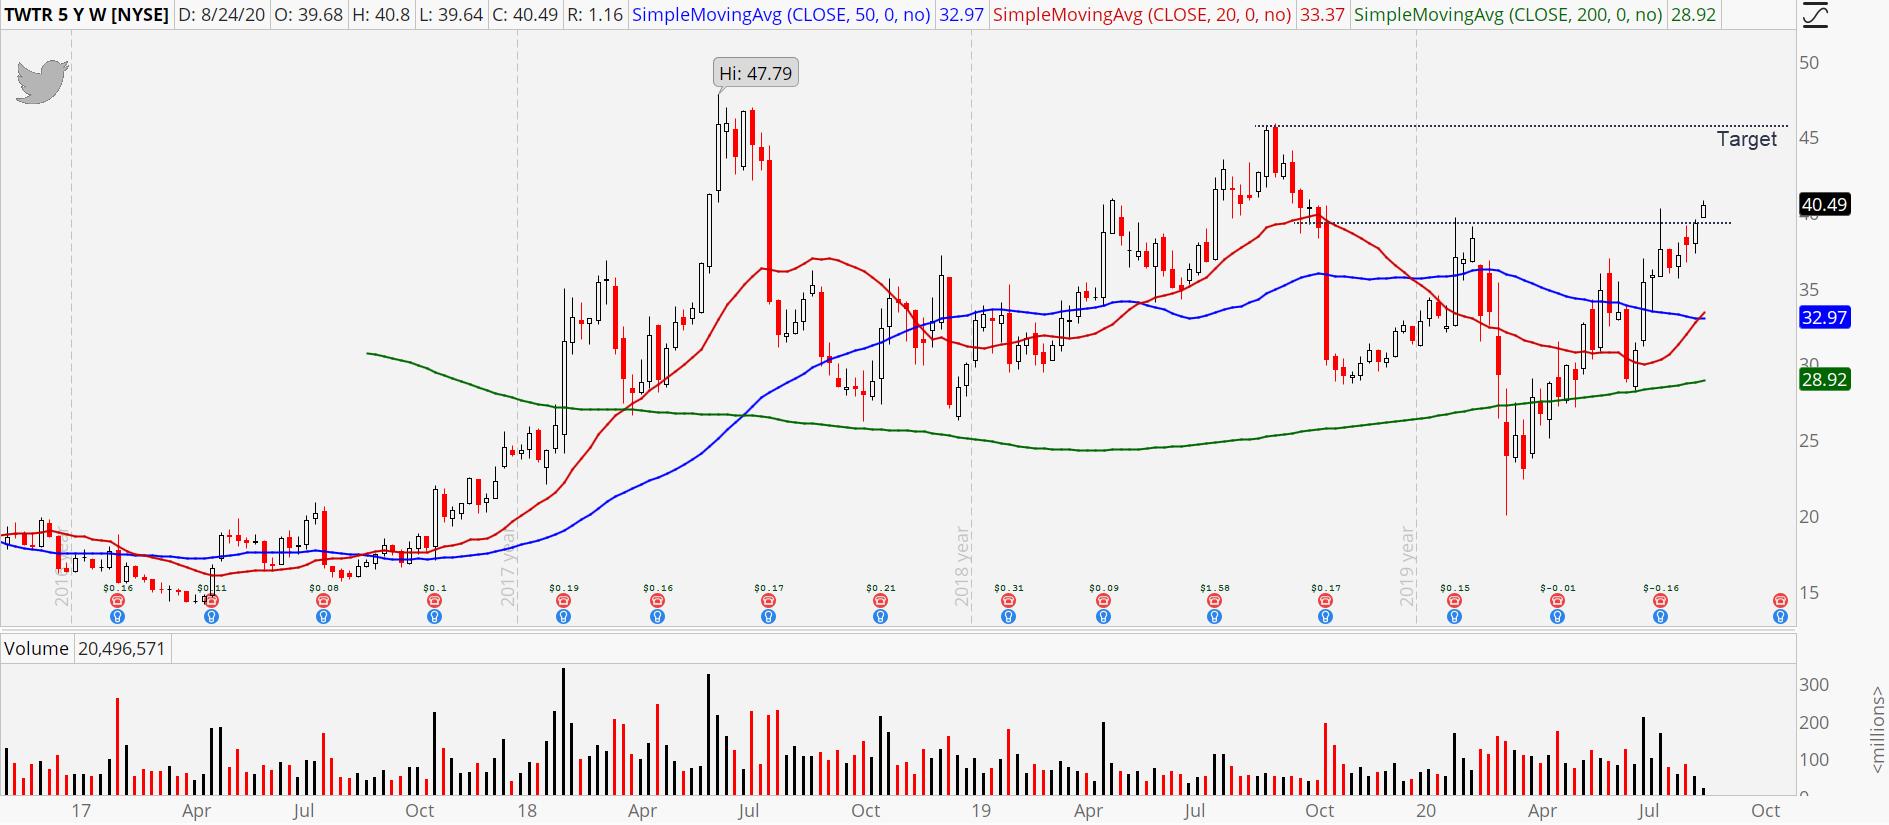 Twitter (TWTR) stock weekly chart showing upside targetrt